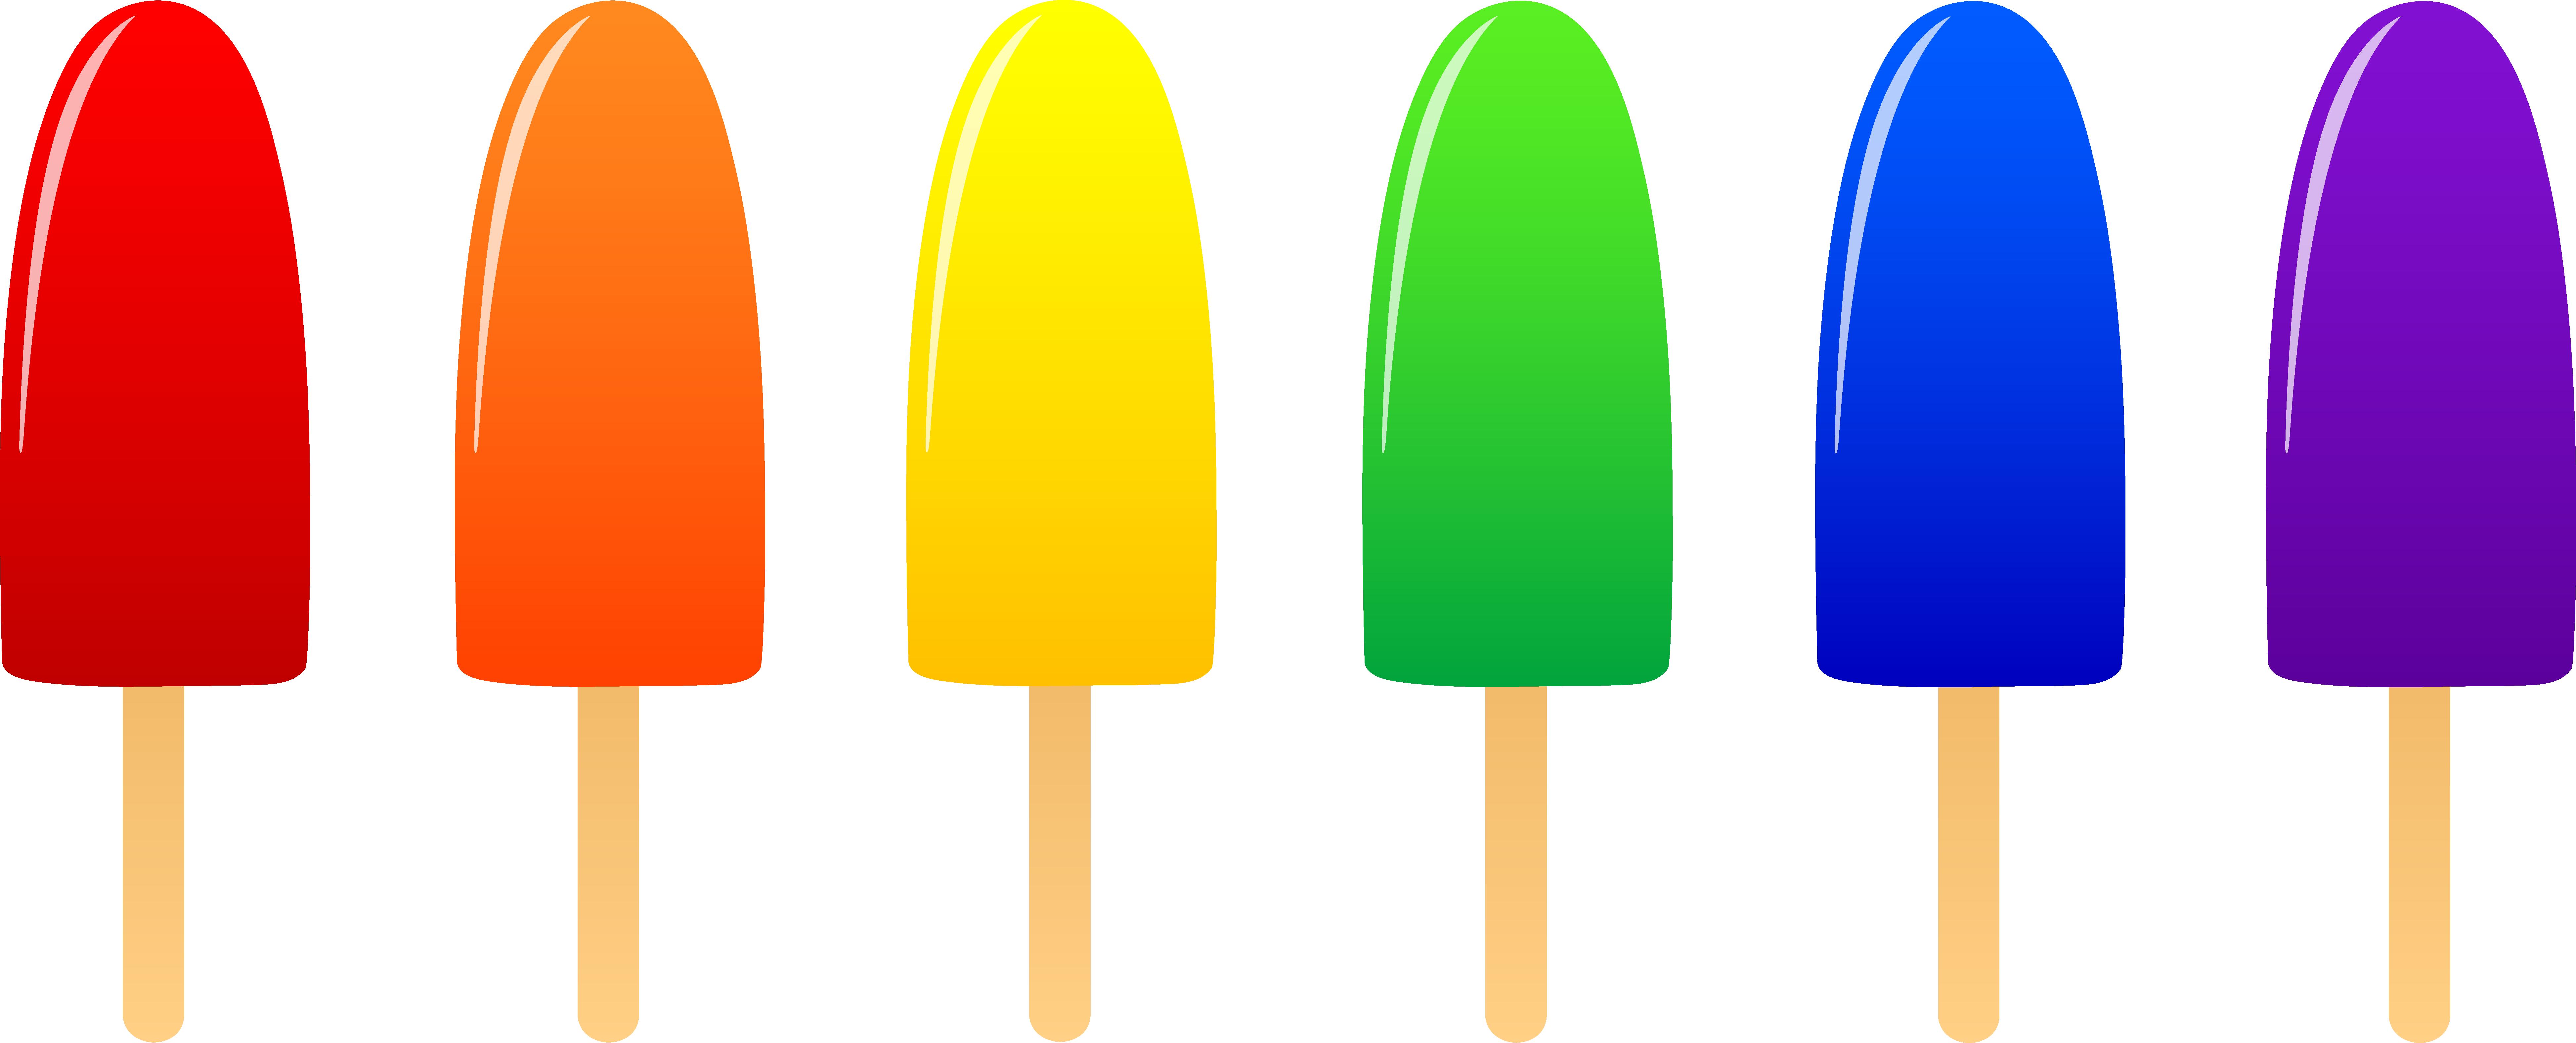 Cream ice drop pencil. Flag clipart summer